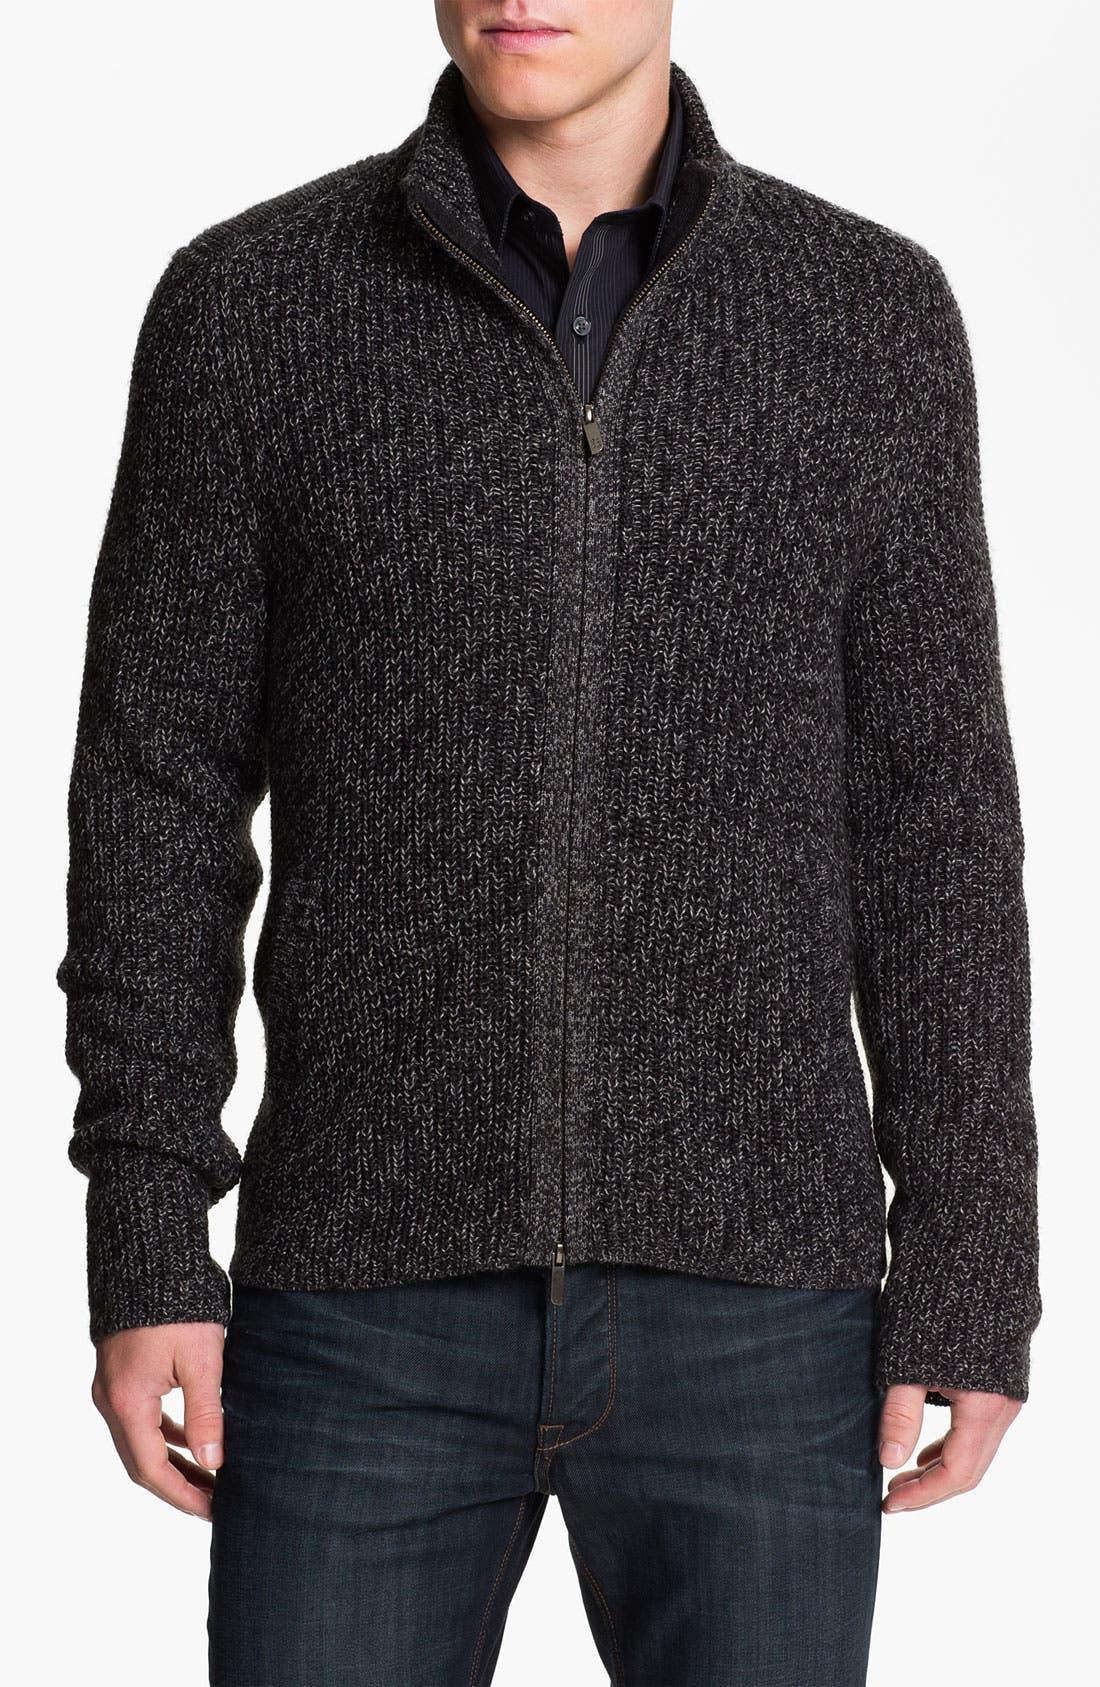 Main Image - Calibrate 'Altman' Wool Blend Zip Cardigan